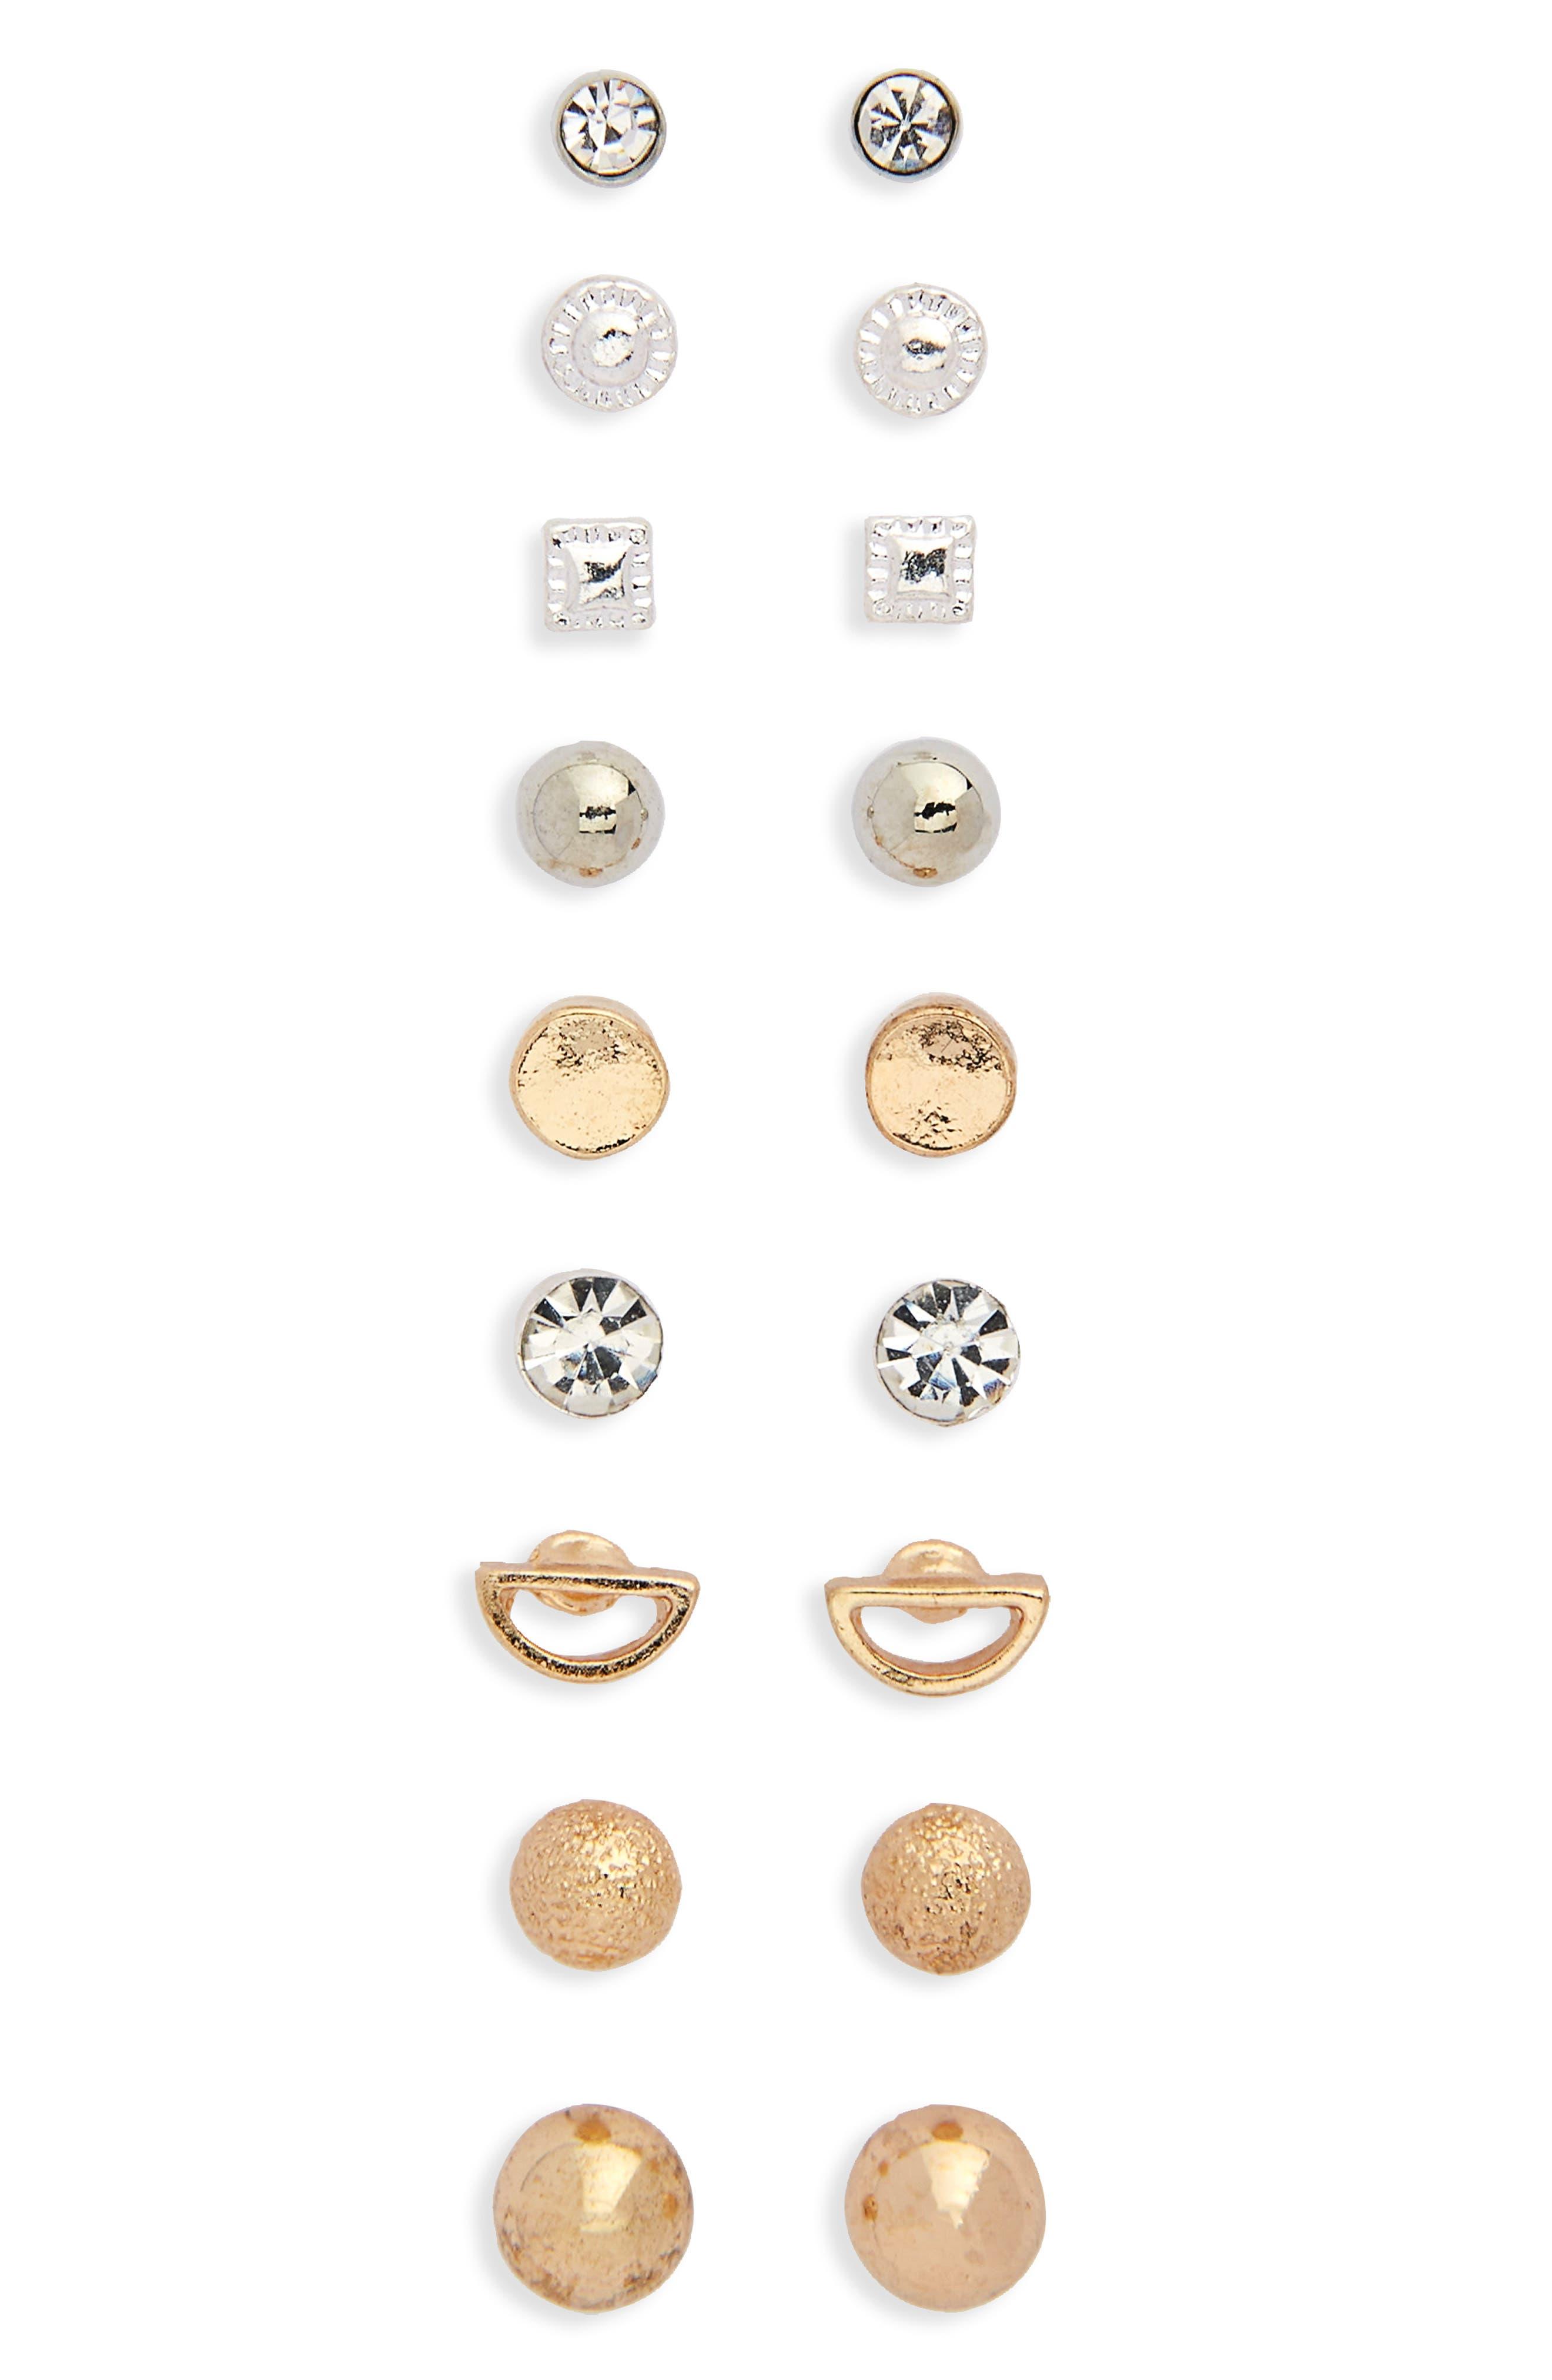 9-Pack Dainty Stud Earrings,                             Main thumbnail 1, color,                             710